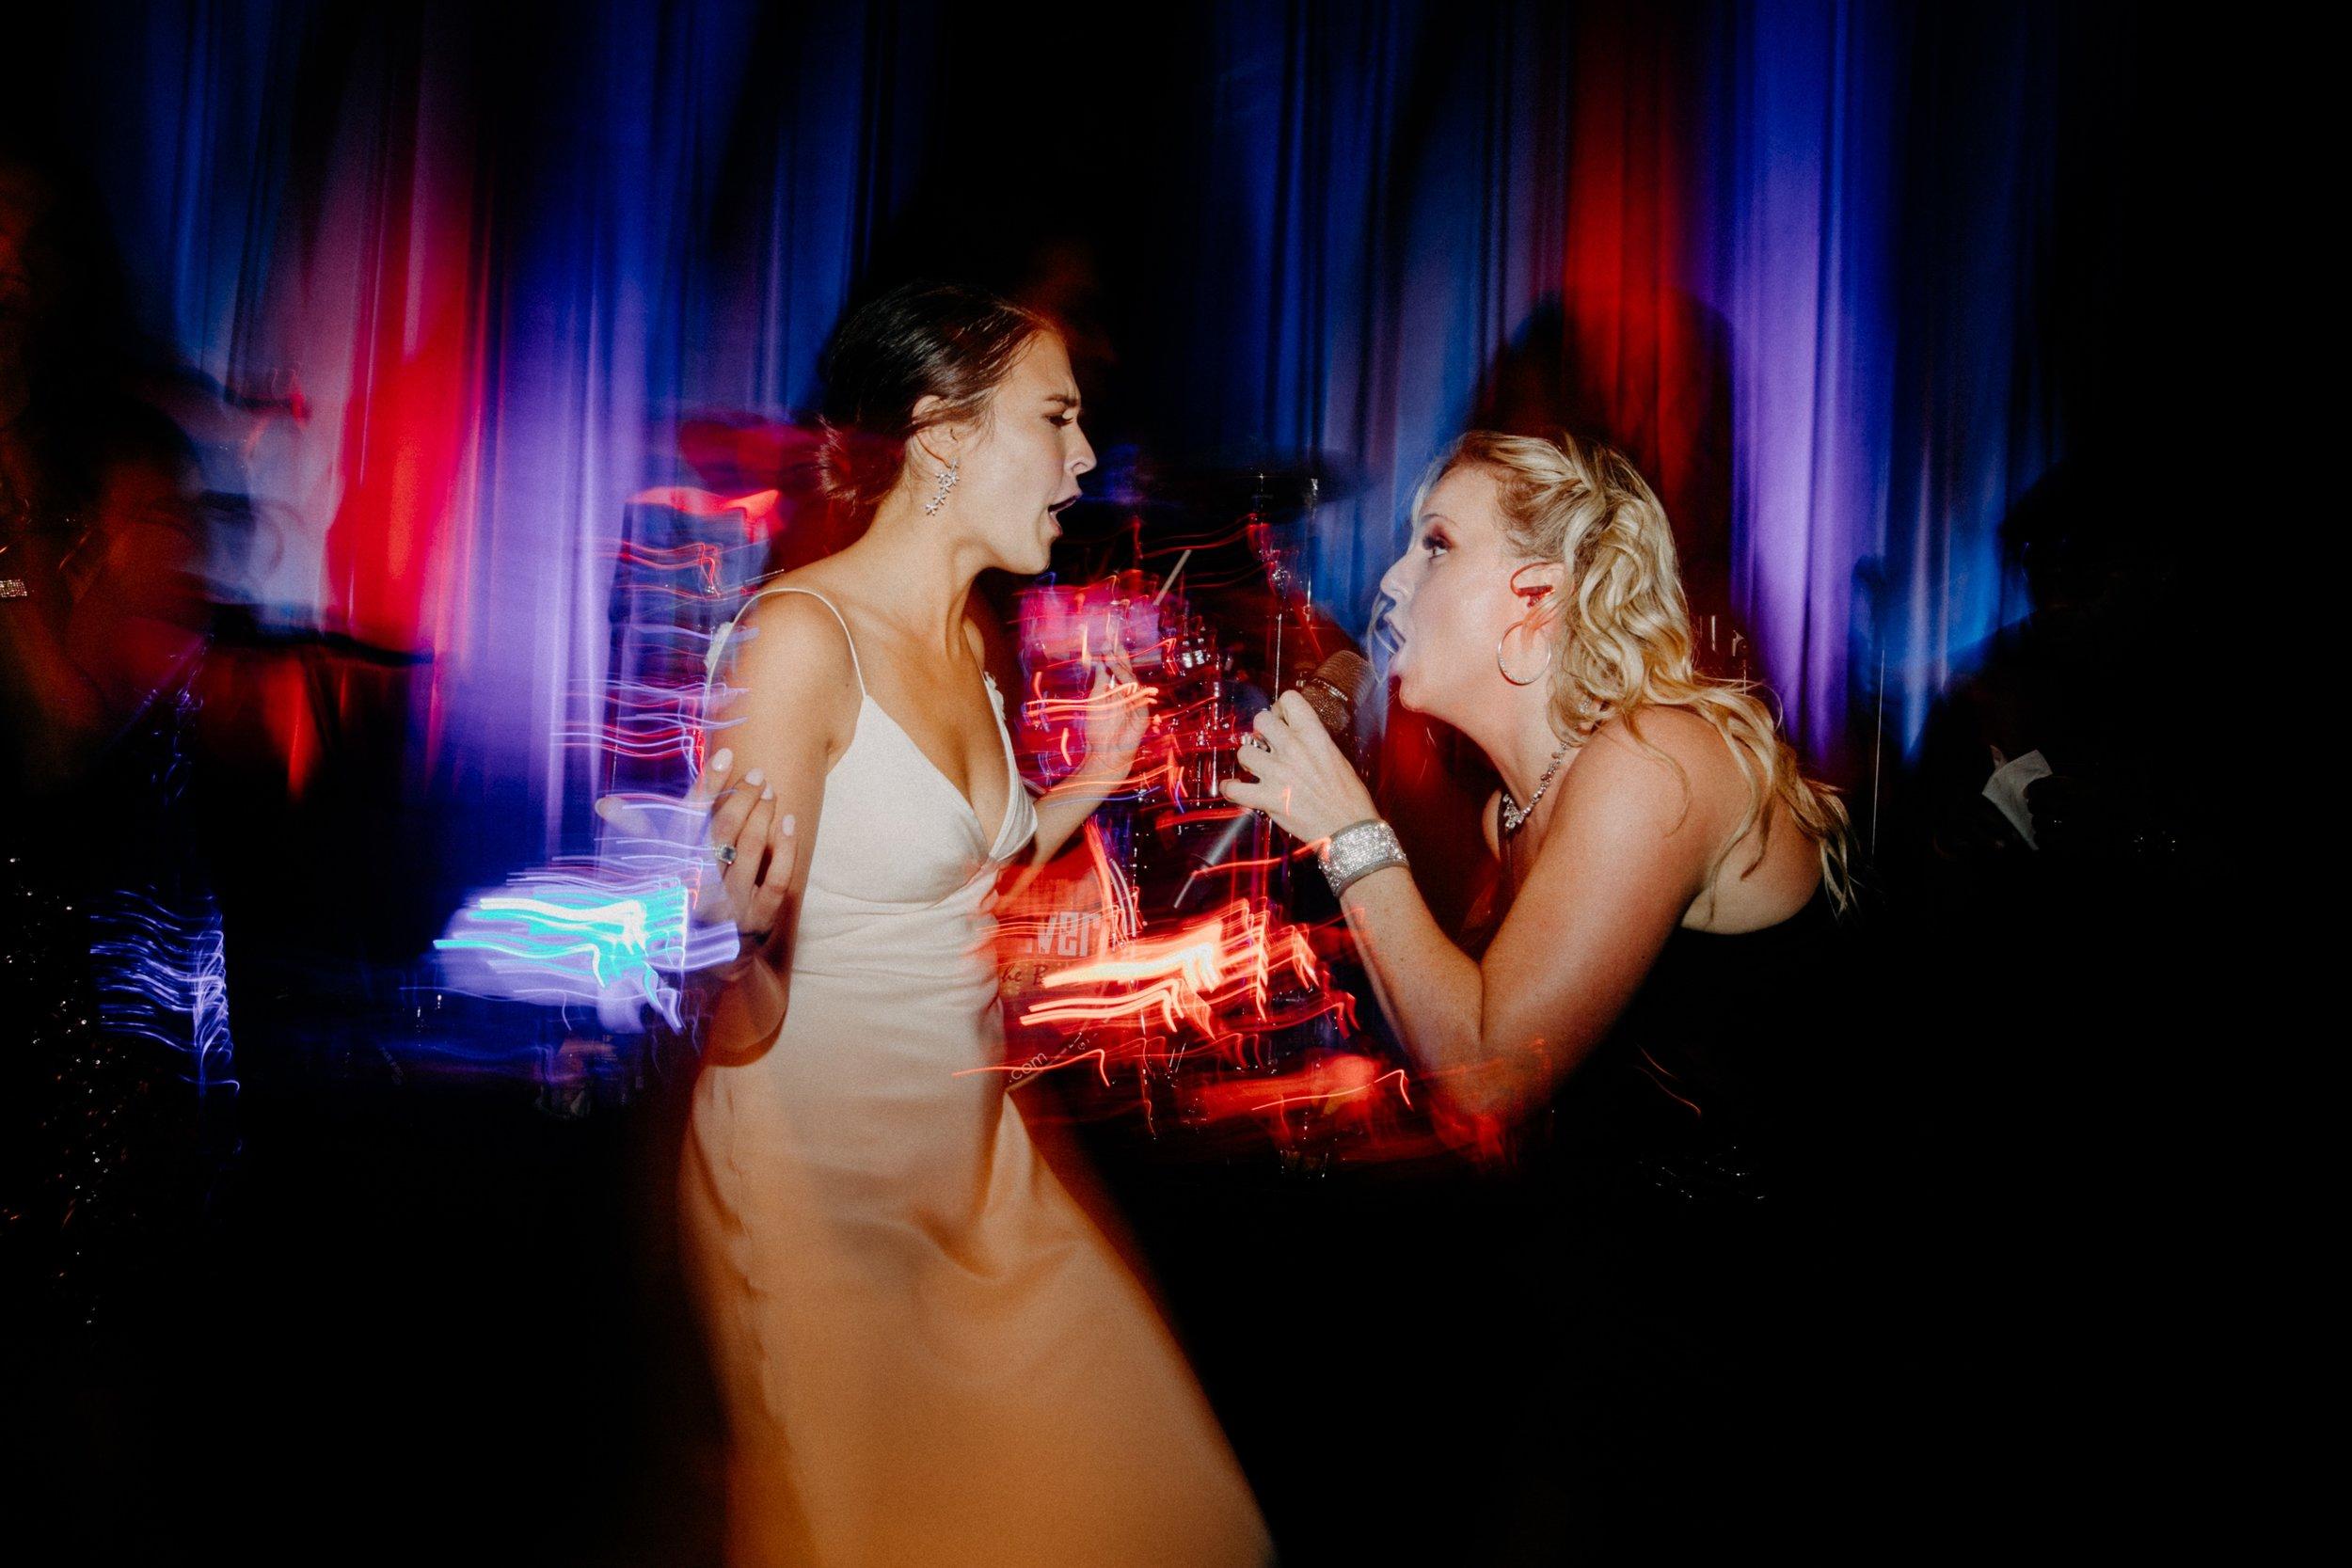 st-anthony-hotel-wedding-photography-10200san-antonio.JPG